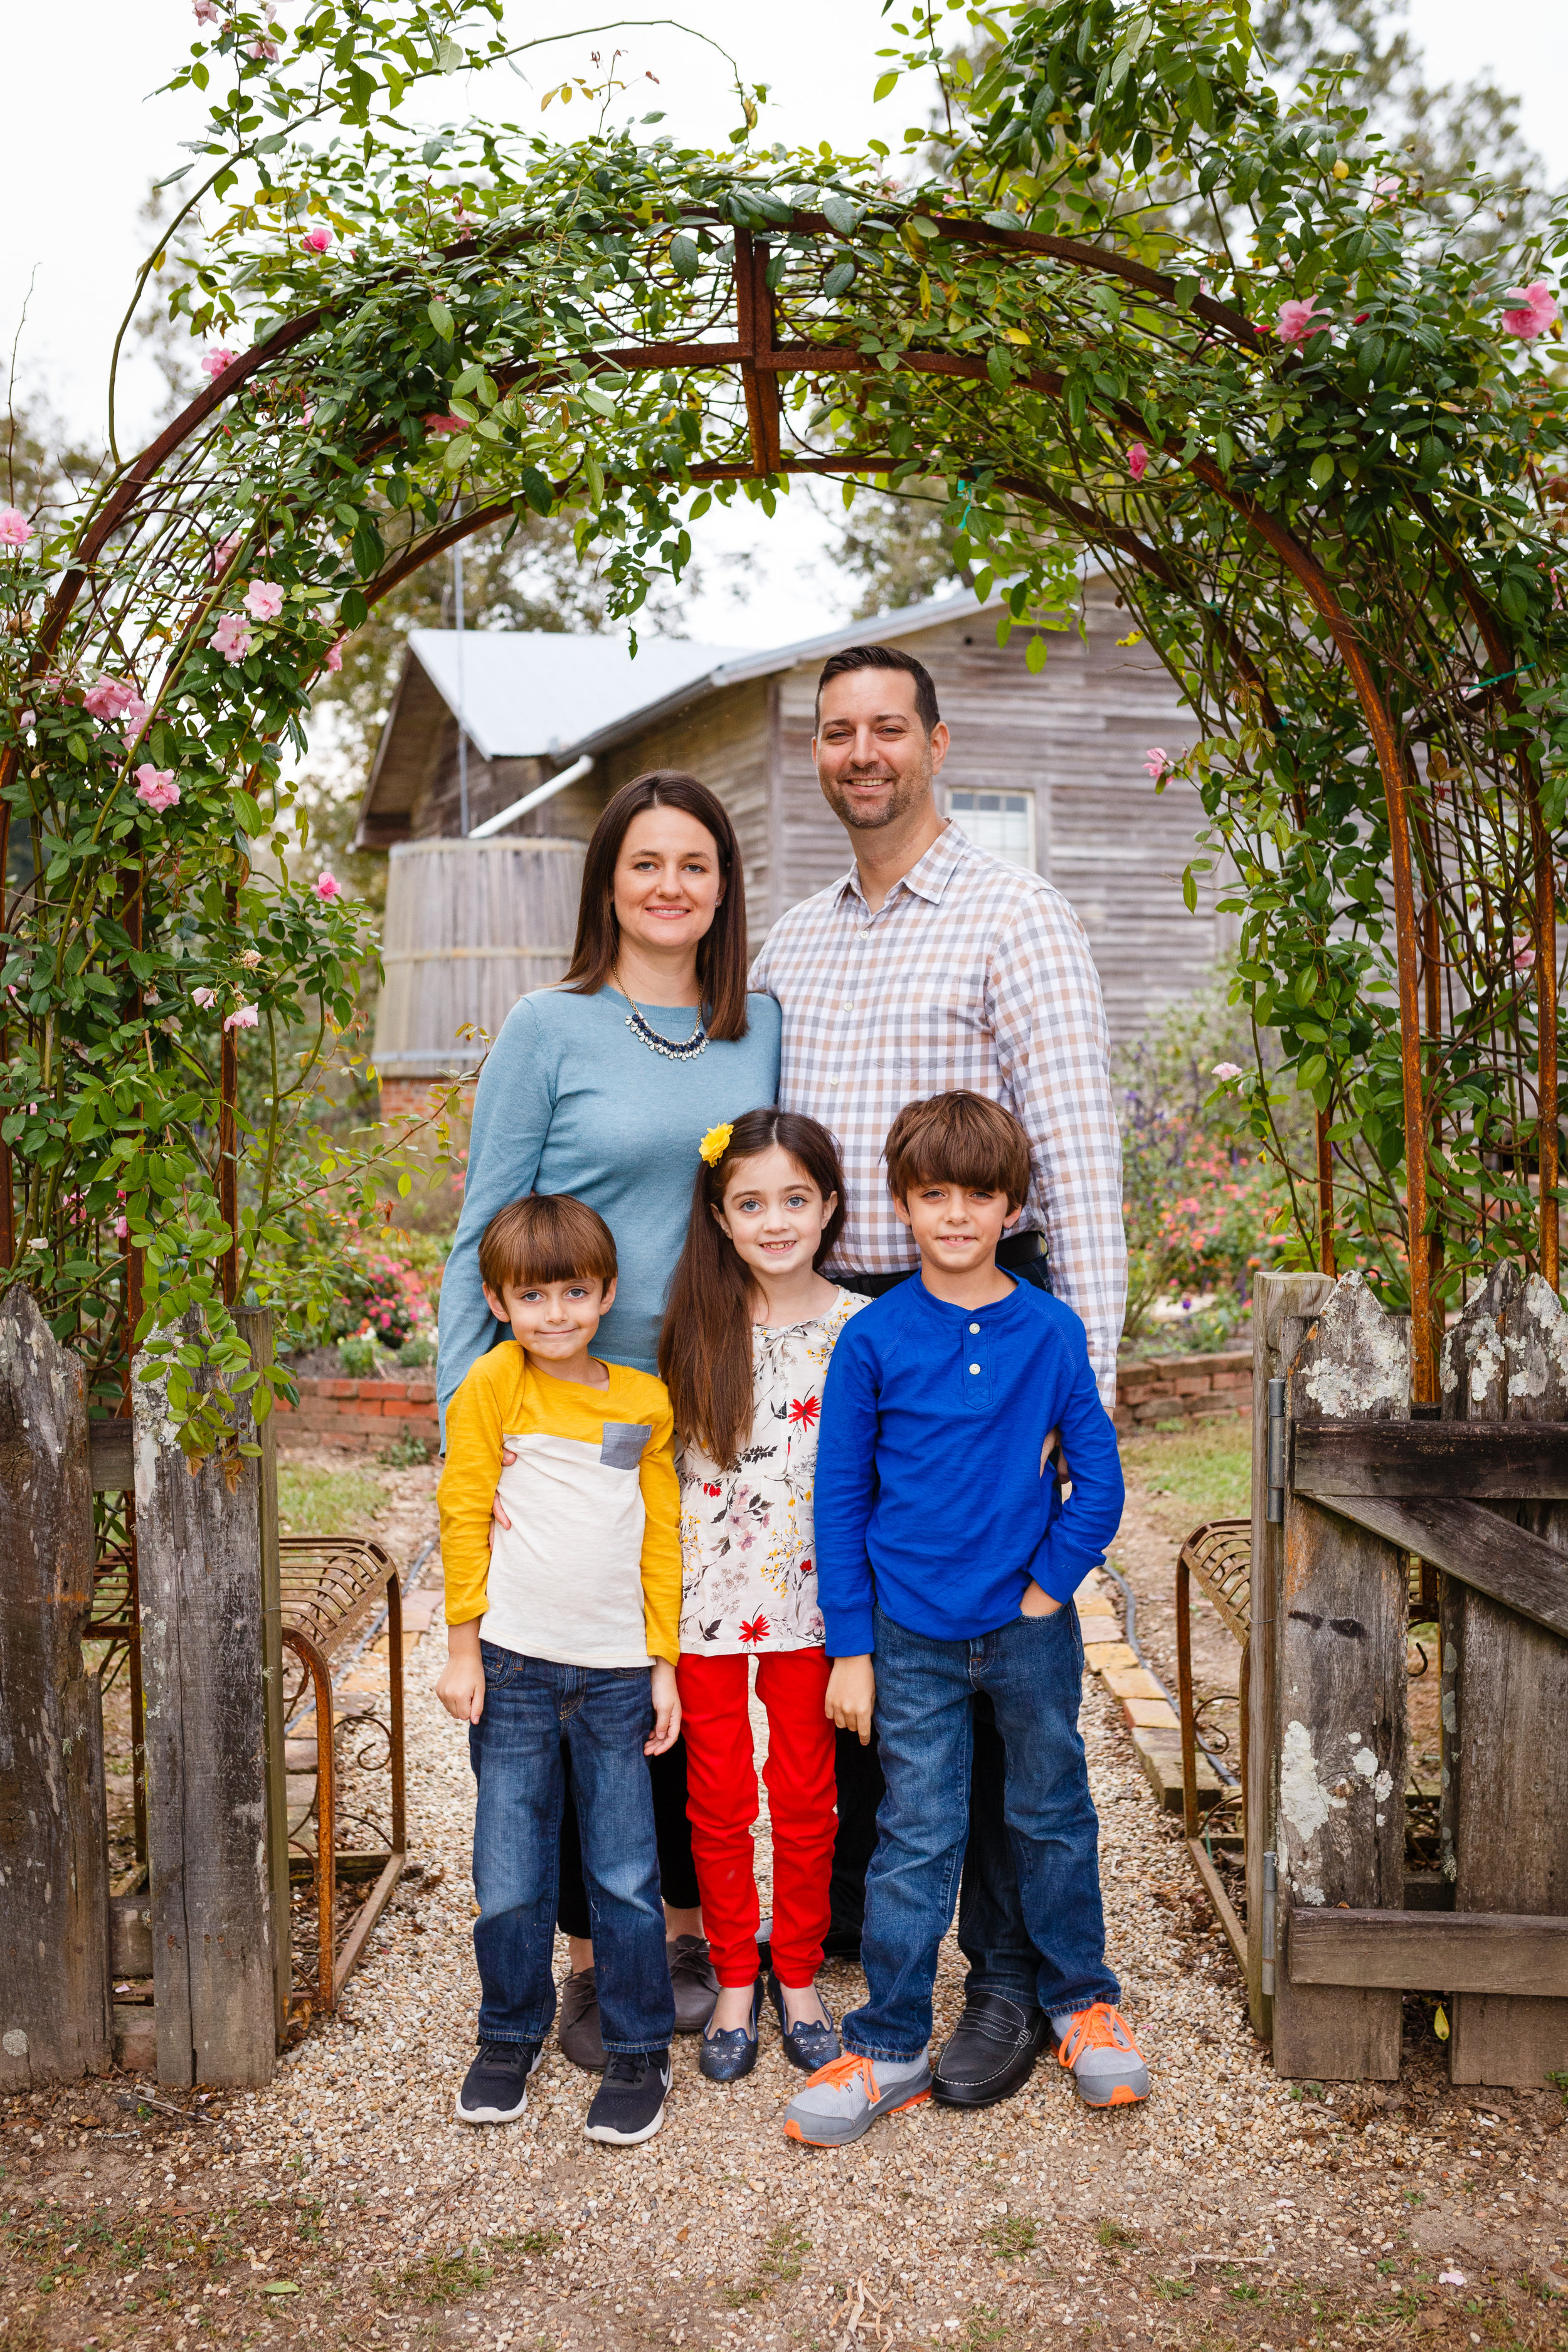 Family-child-portrait-lafayette-broussard-youngsville-photographer-12.jpg